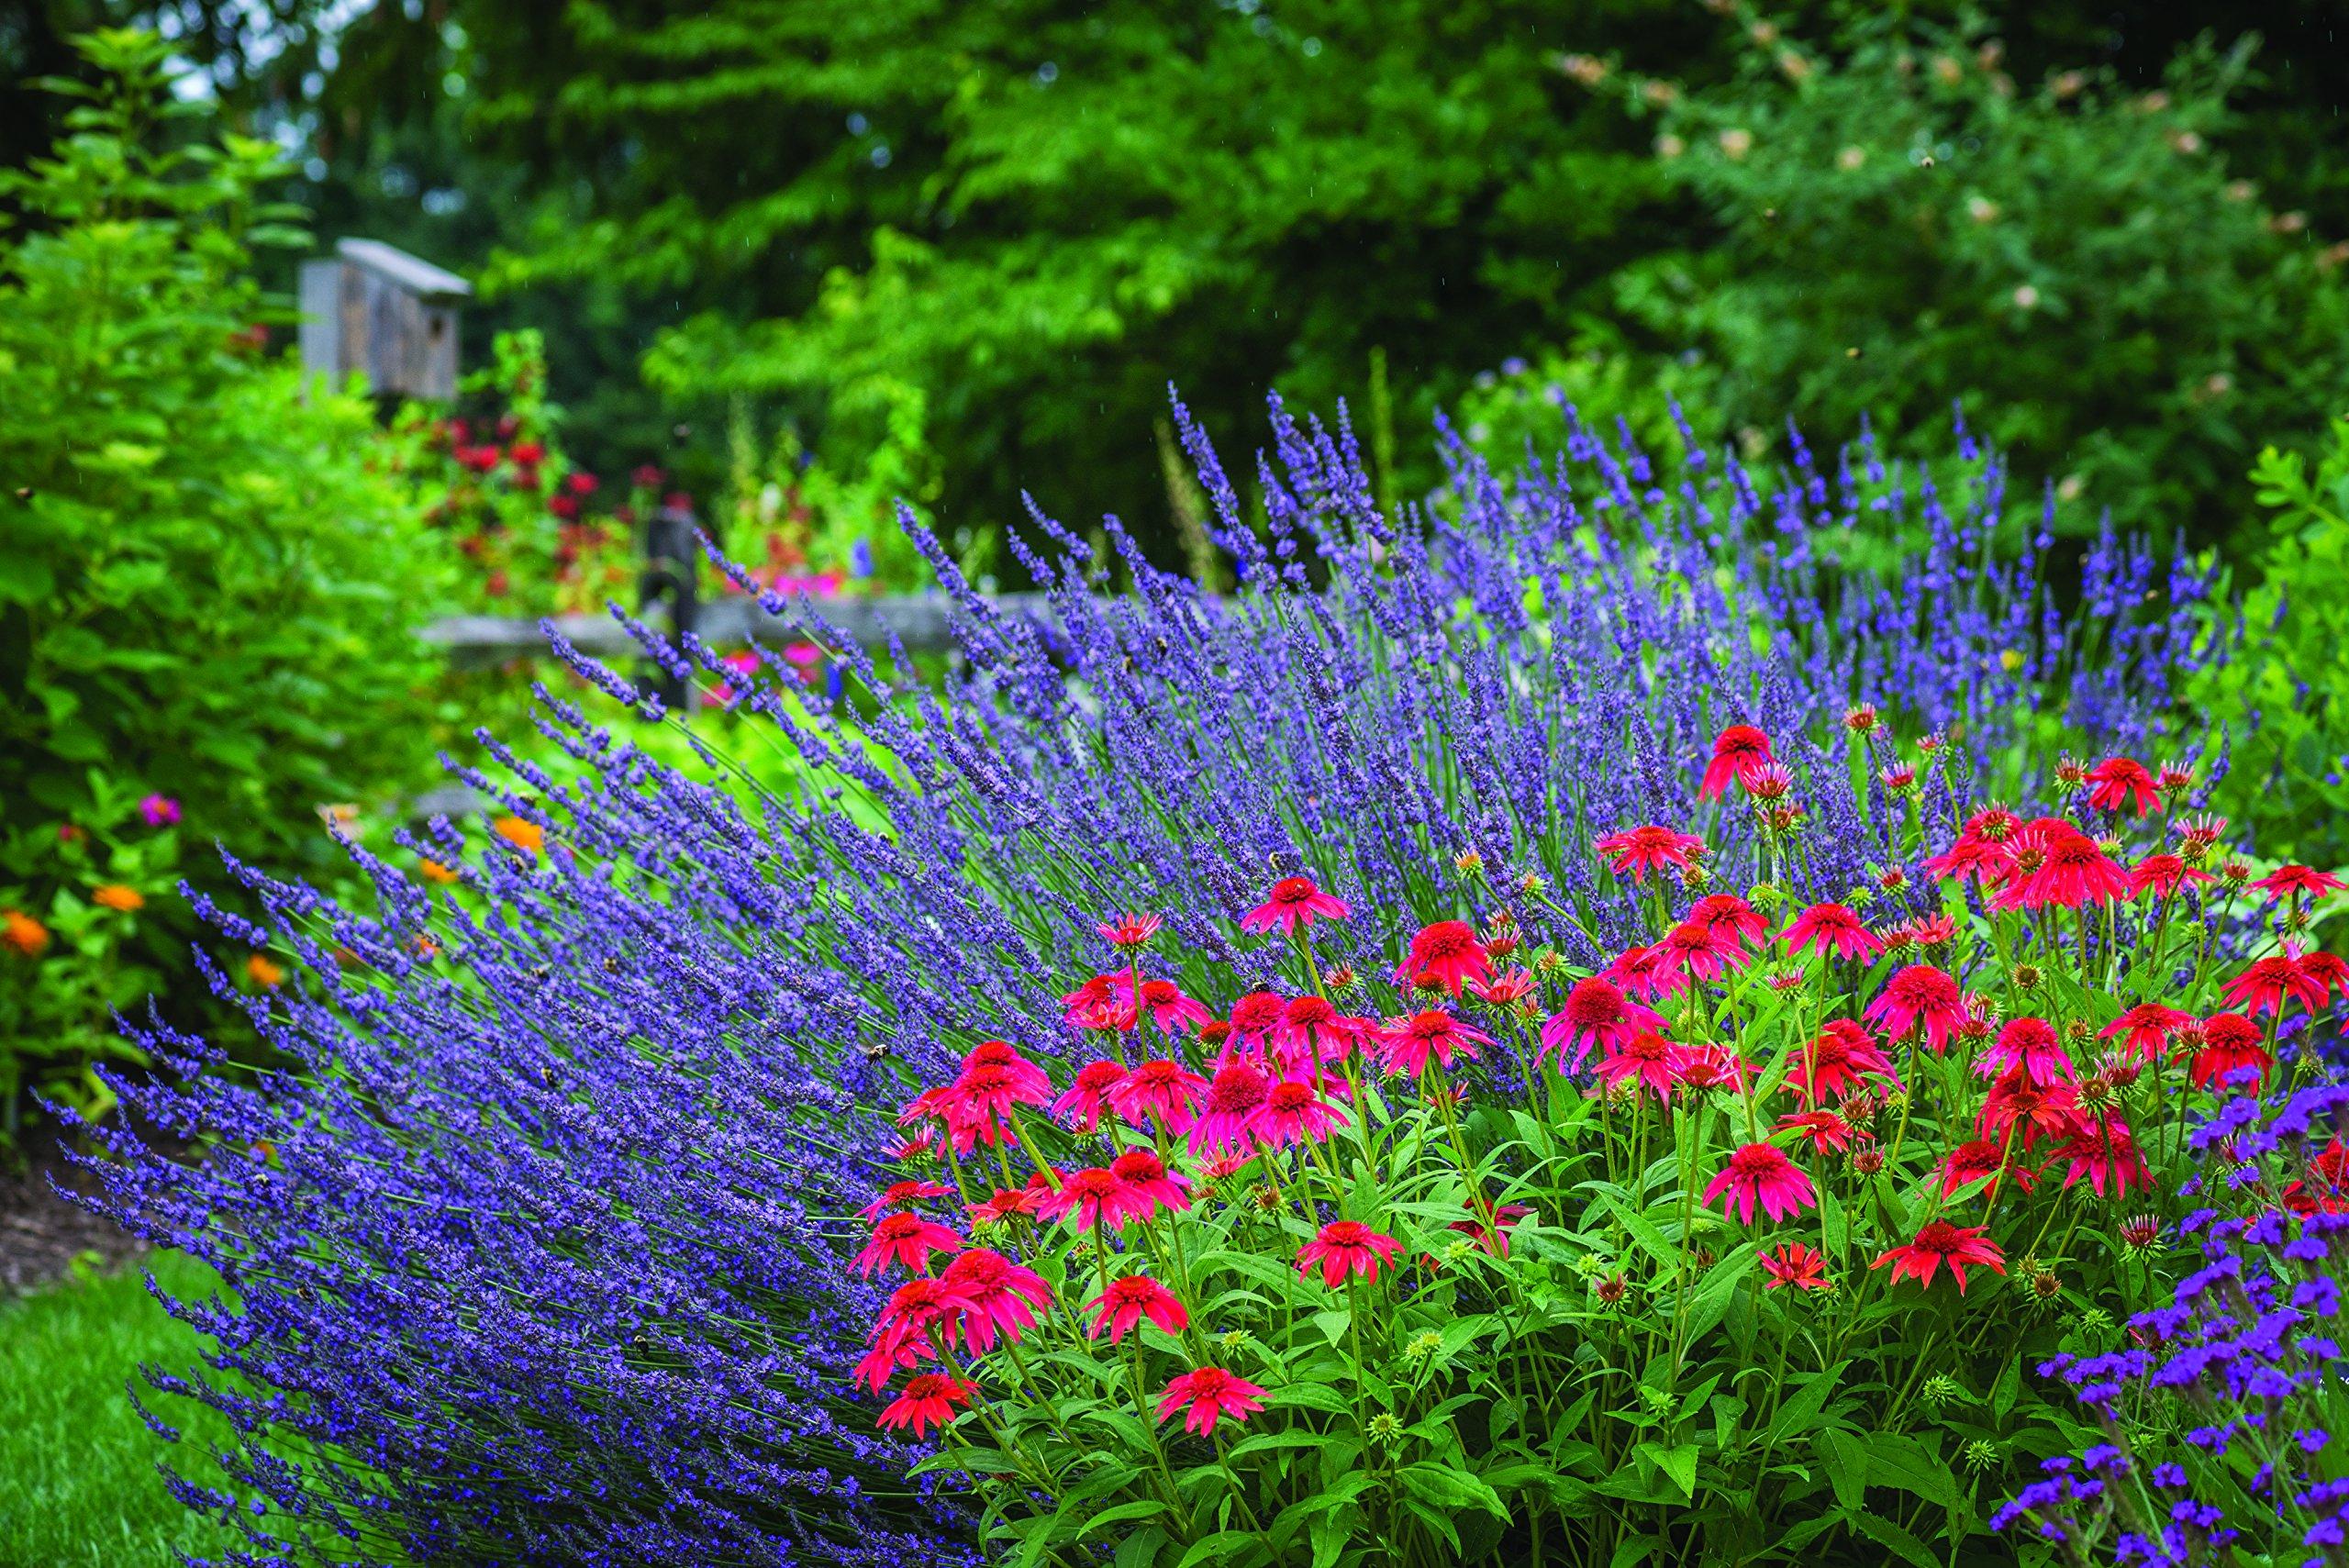 Burpee Perennial Lavender 'Phenomenal', 4'' pots, 4 plants, Fragrant, Evergreen, Pollinator Friendly